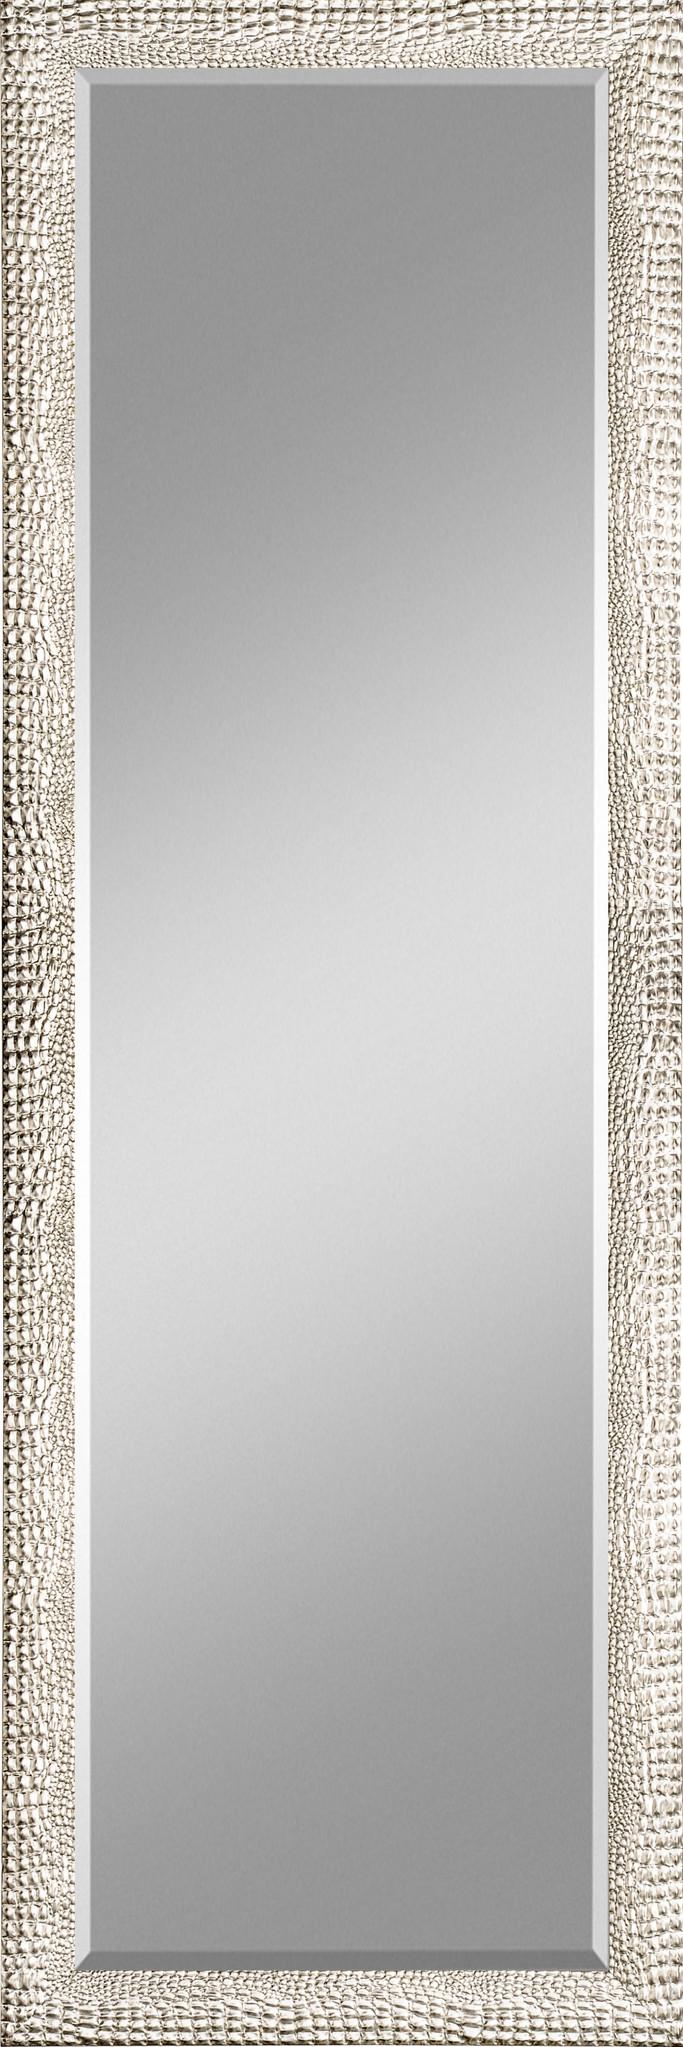 Zalena Rahmenspiegel Tiberius im Kroko Stil